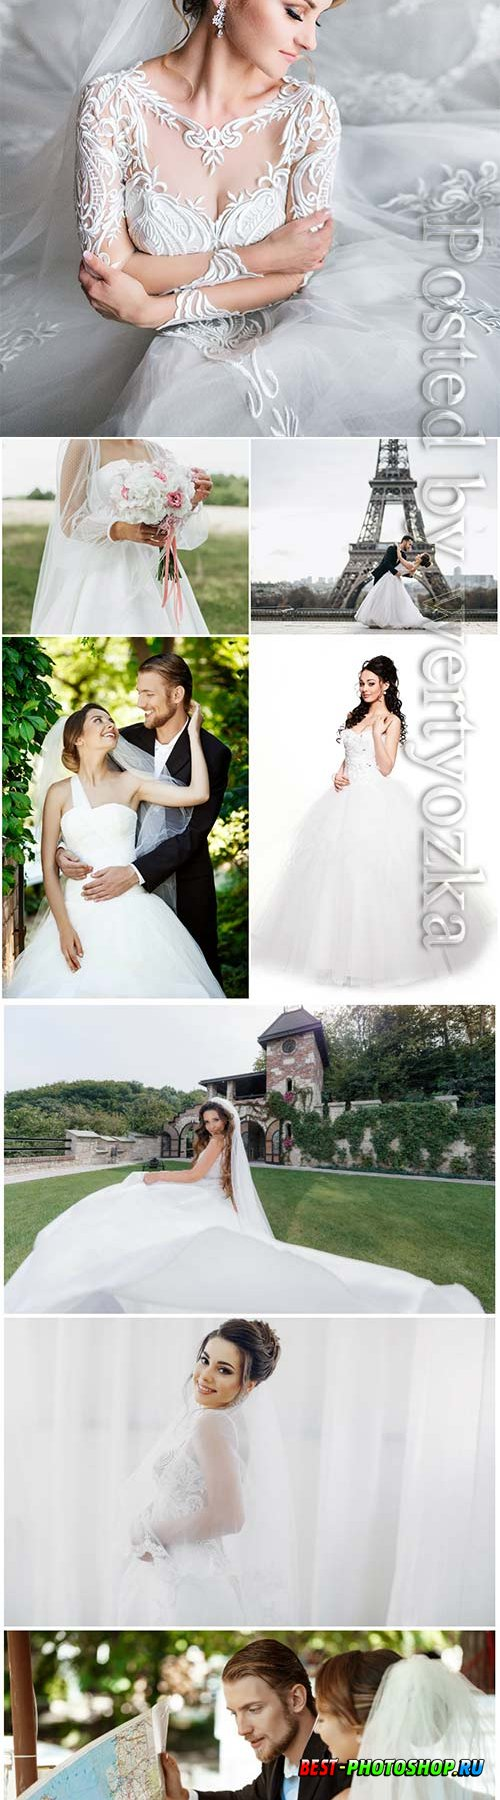 Bride and groom, wedding stock photo